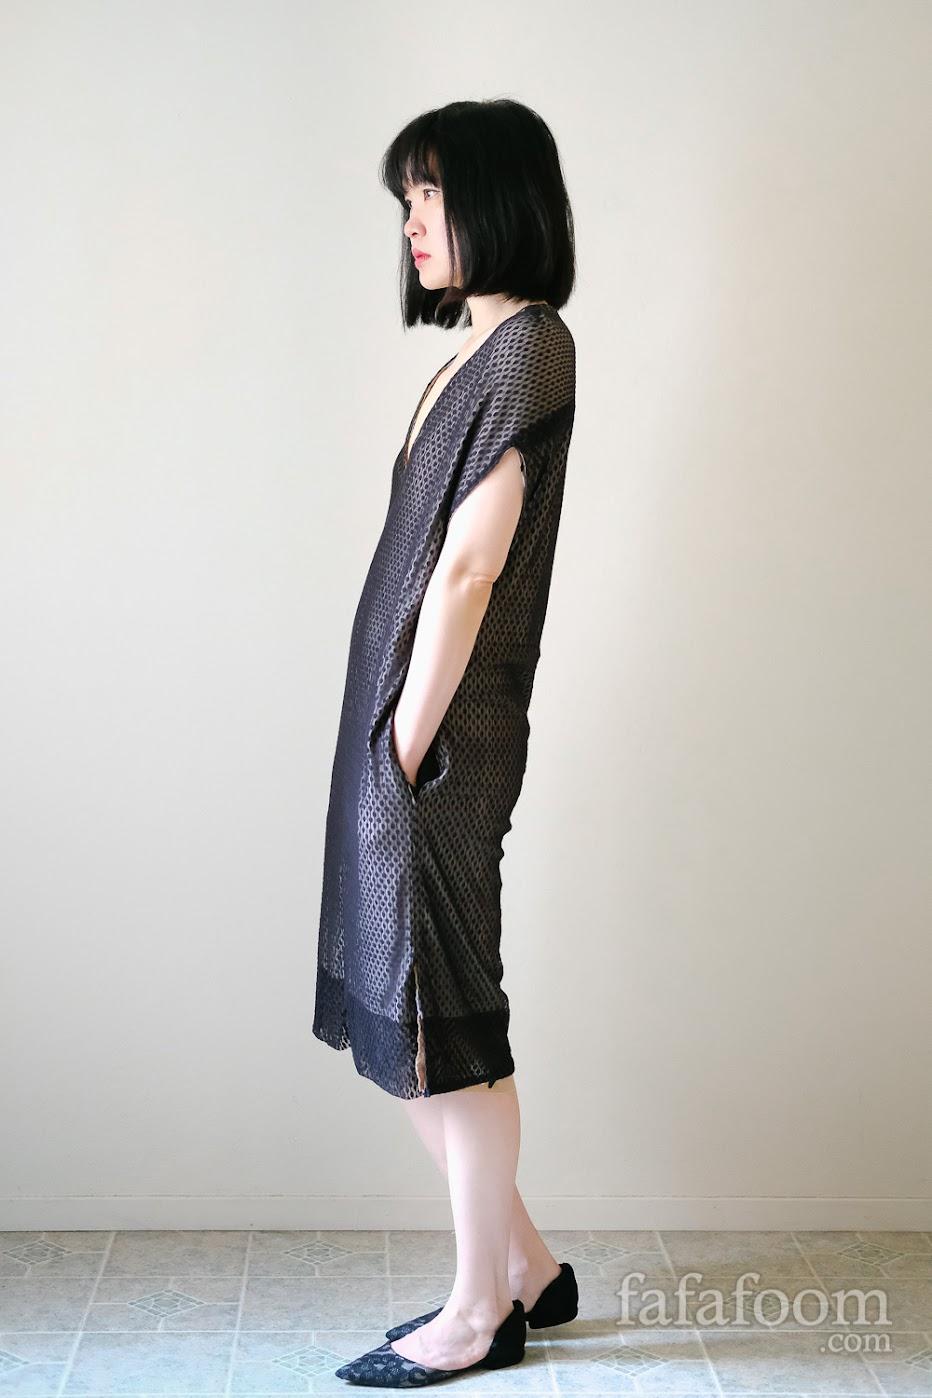 Result: Reversible Dress with Pockets - DIY Fashion Garments   fafafoom.com